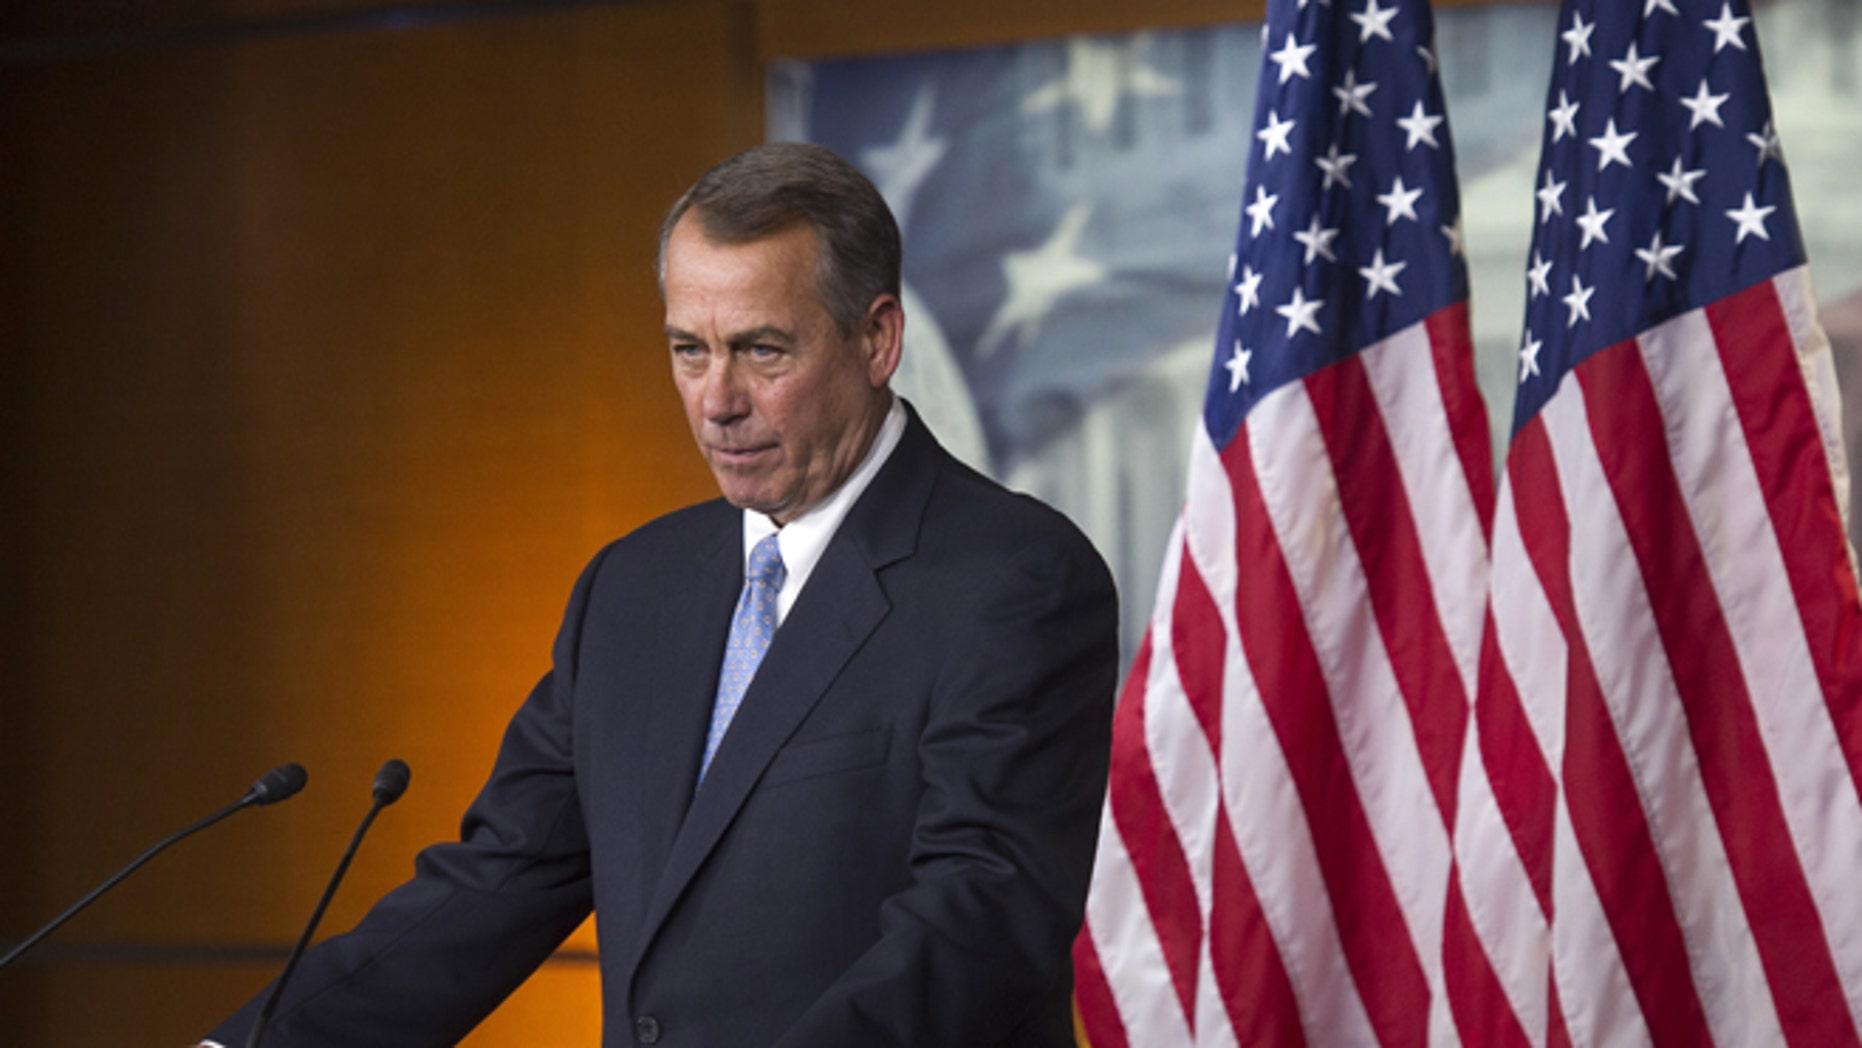 Nov. 6, 2014: House Speaker John Boehner at news conference on Capitol Hill, in Washington, D.C.